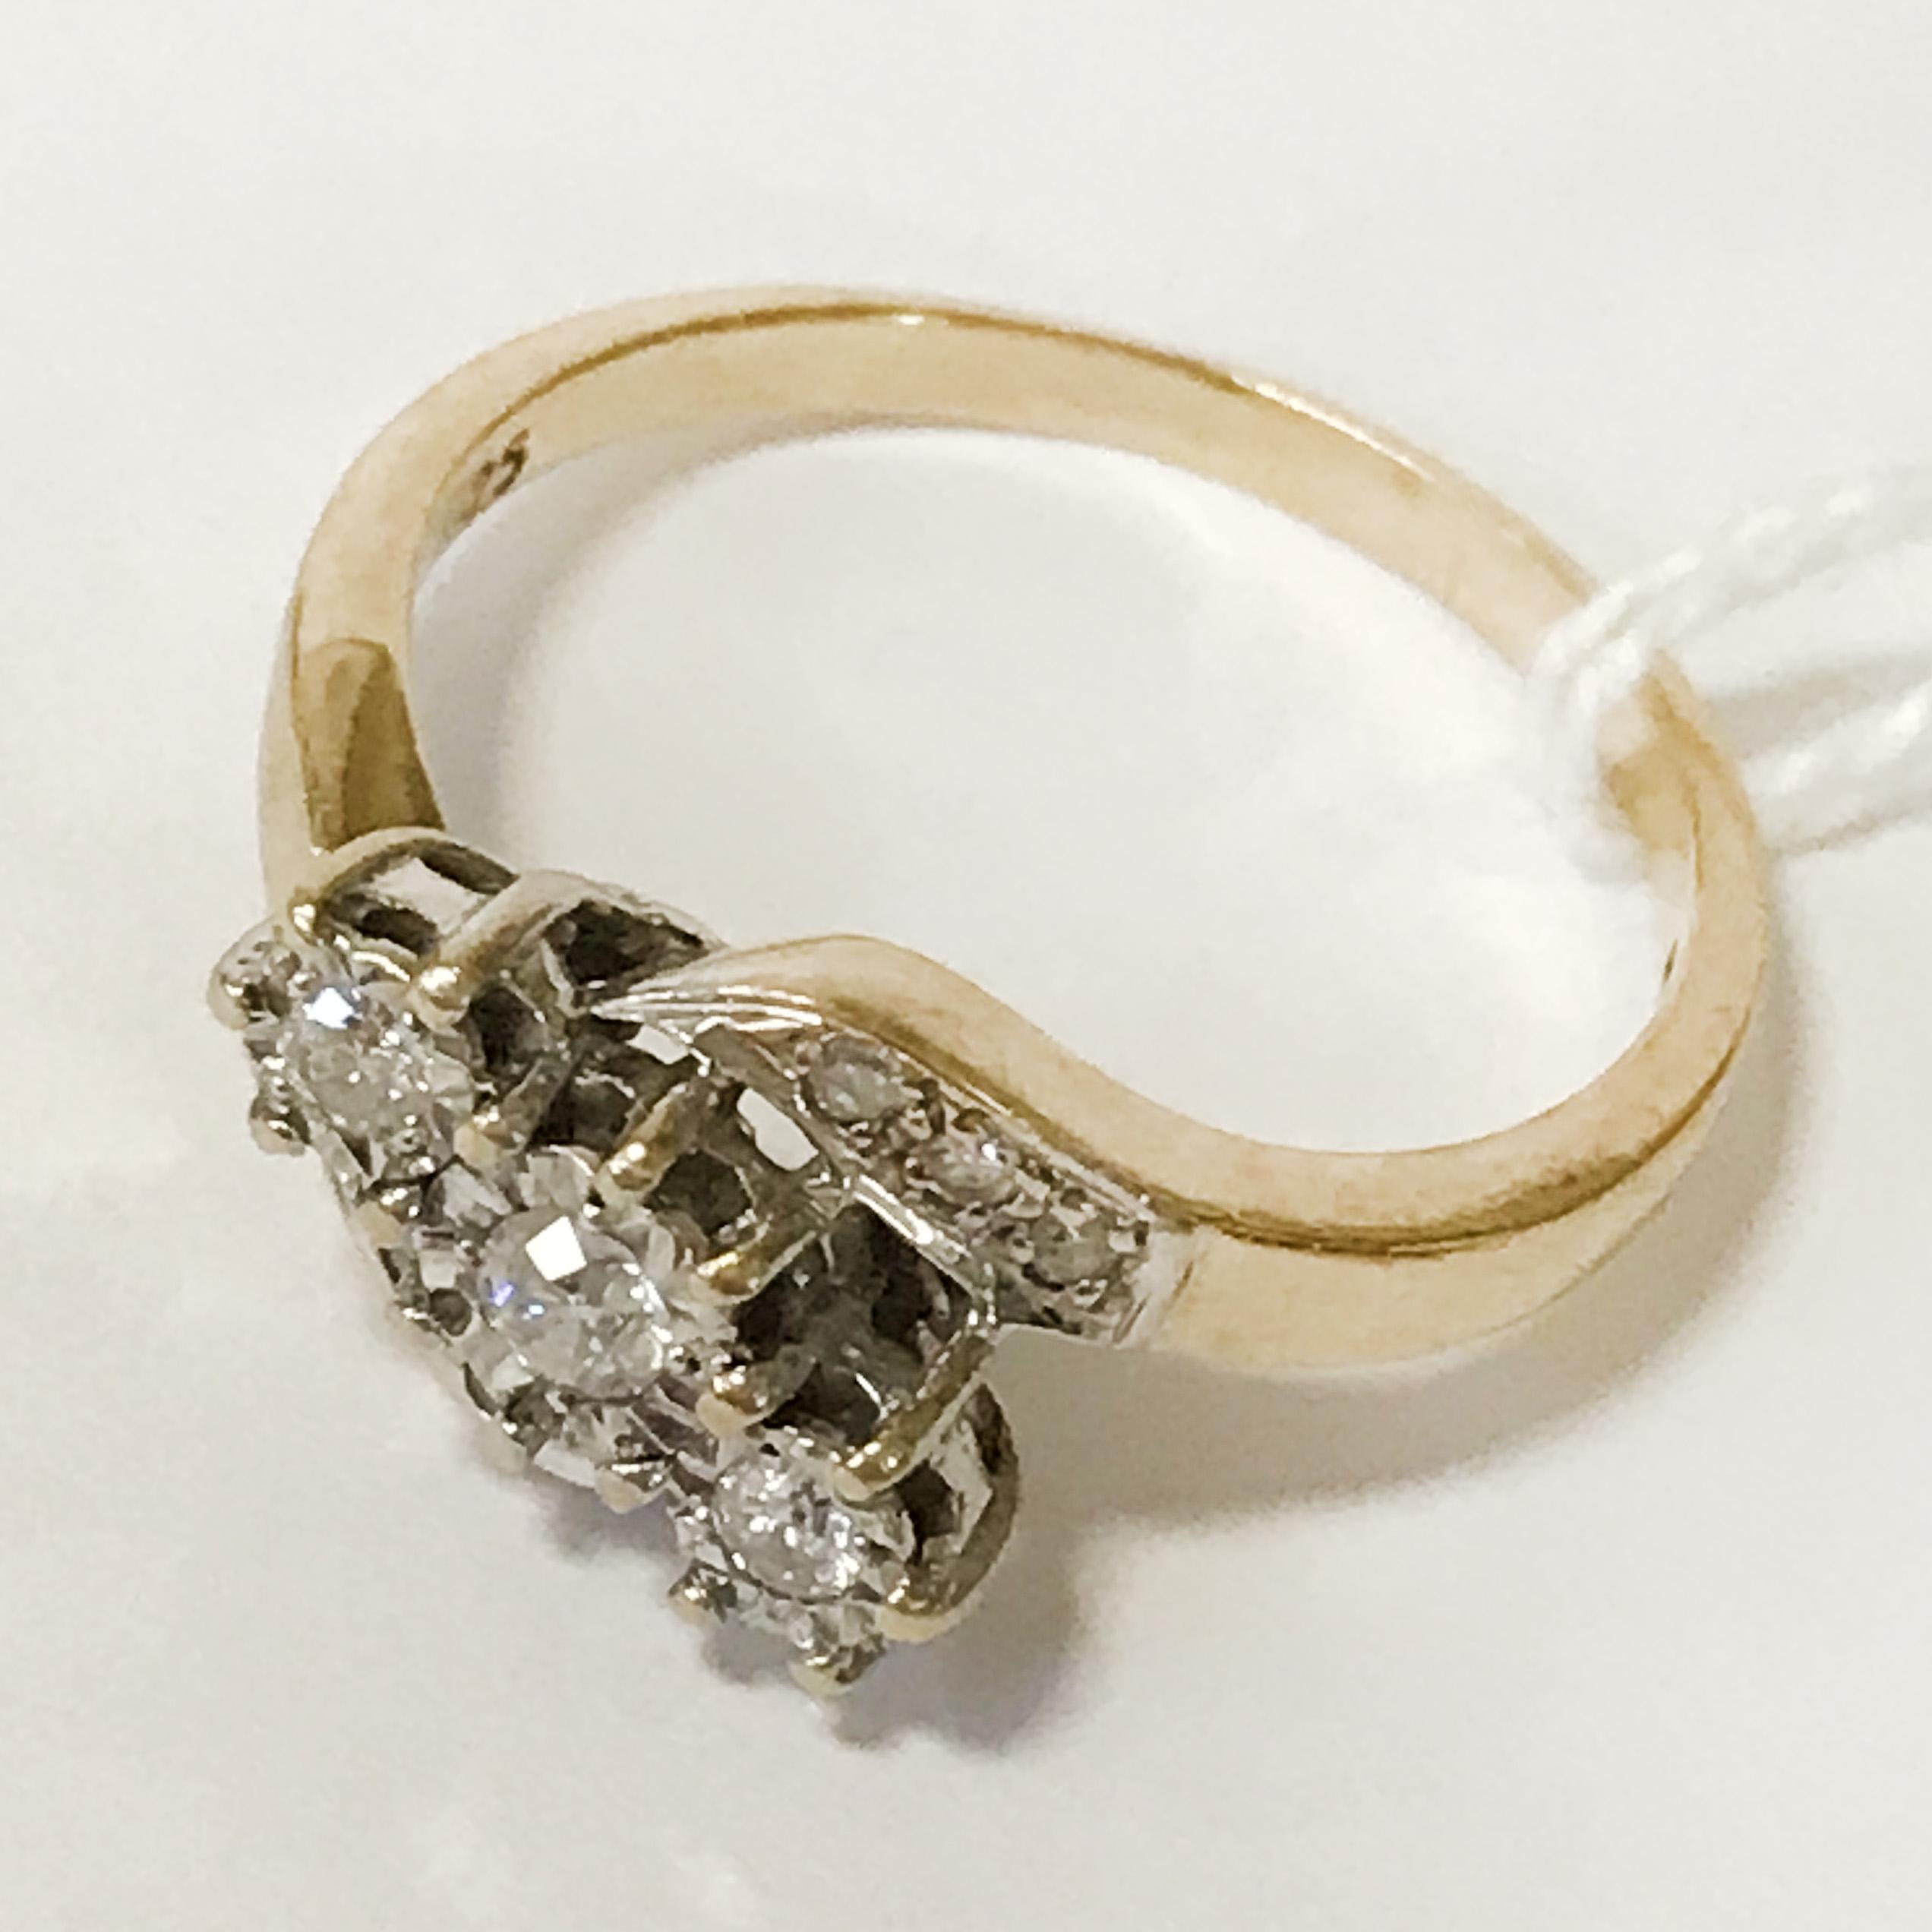 9CT YELLOW GOLD 3 STONE DIAMOND RING - SIZE R